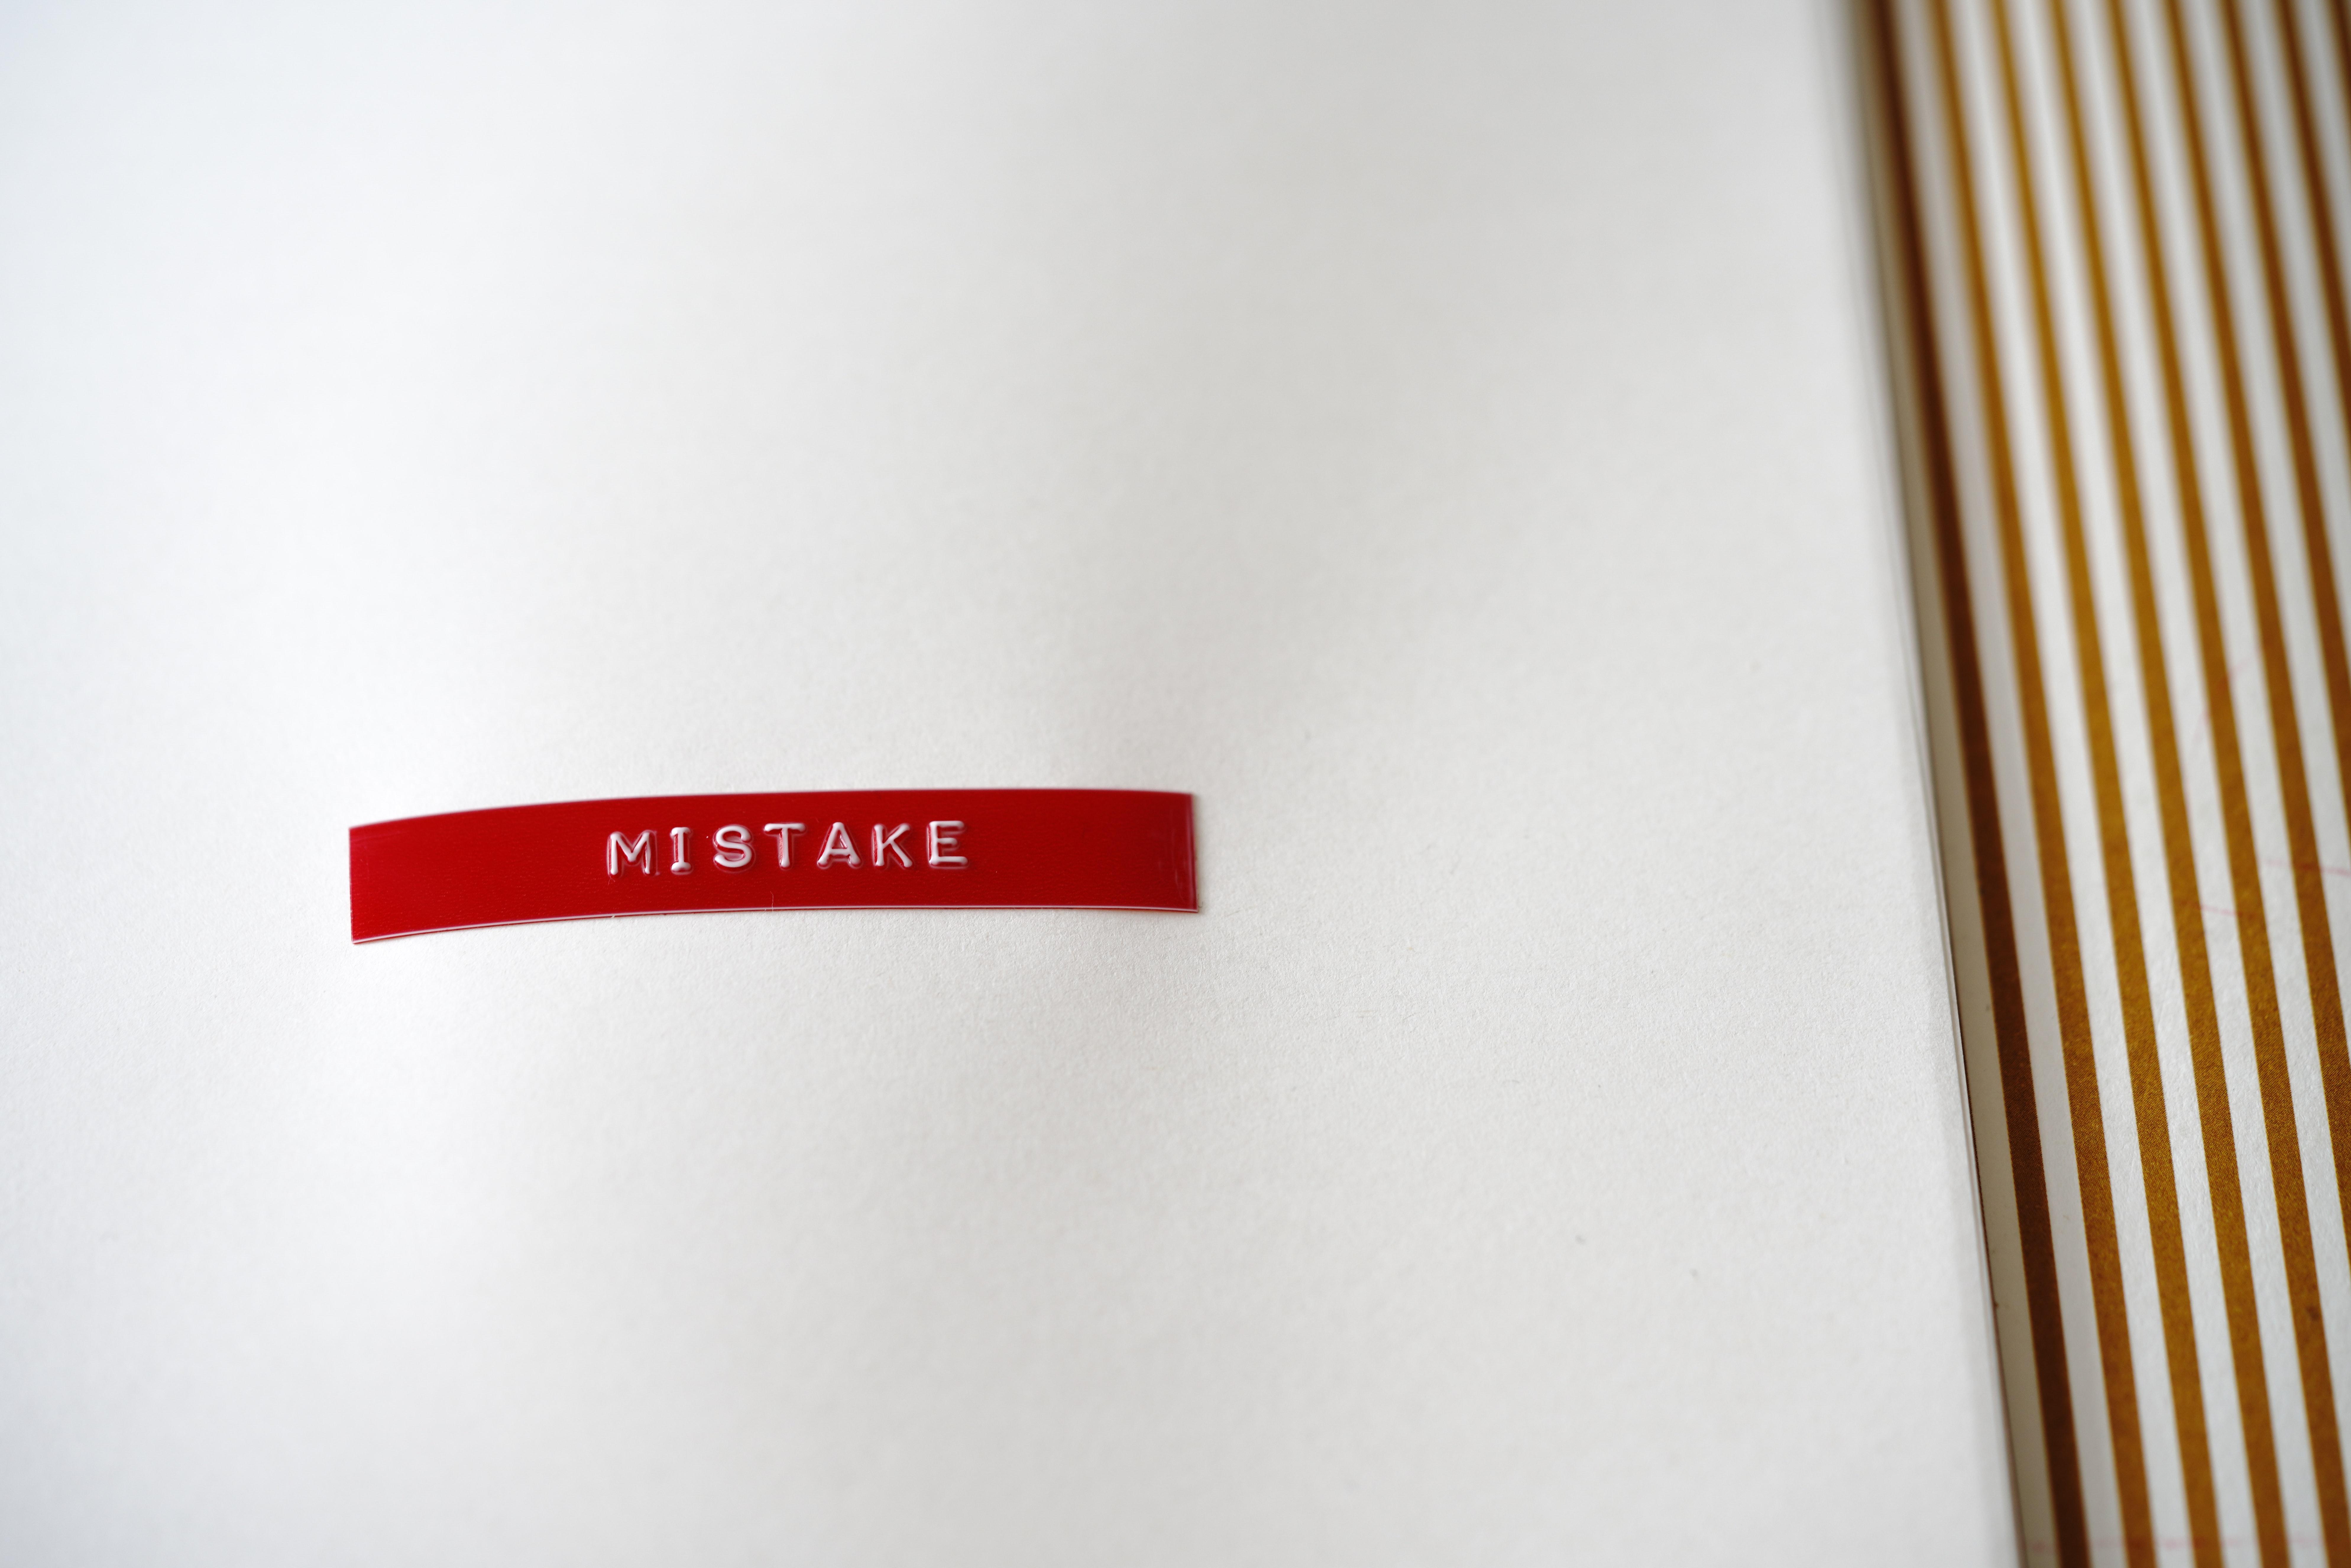 Mistake Inscription